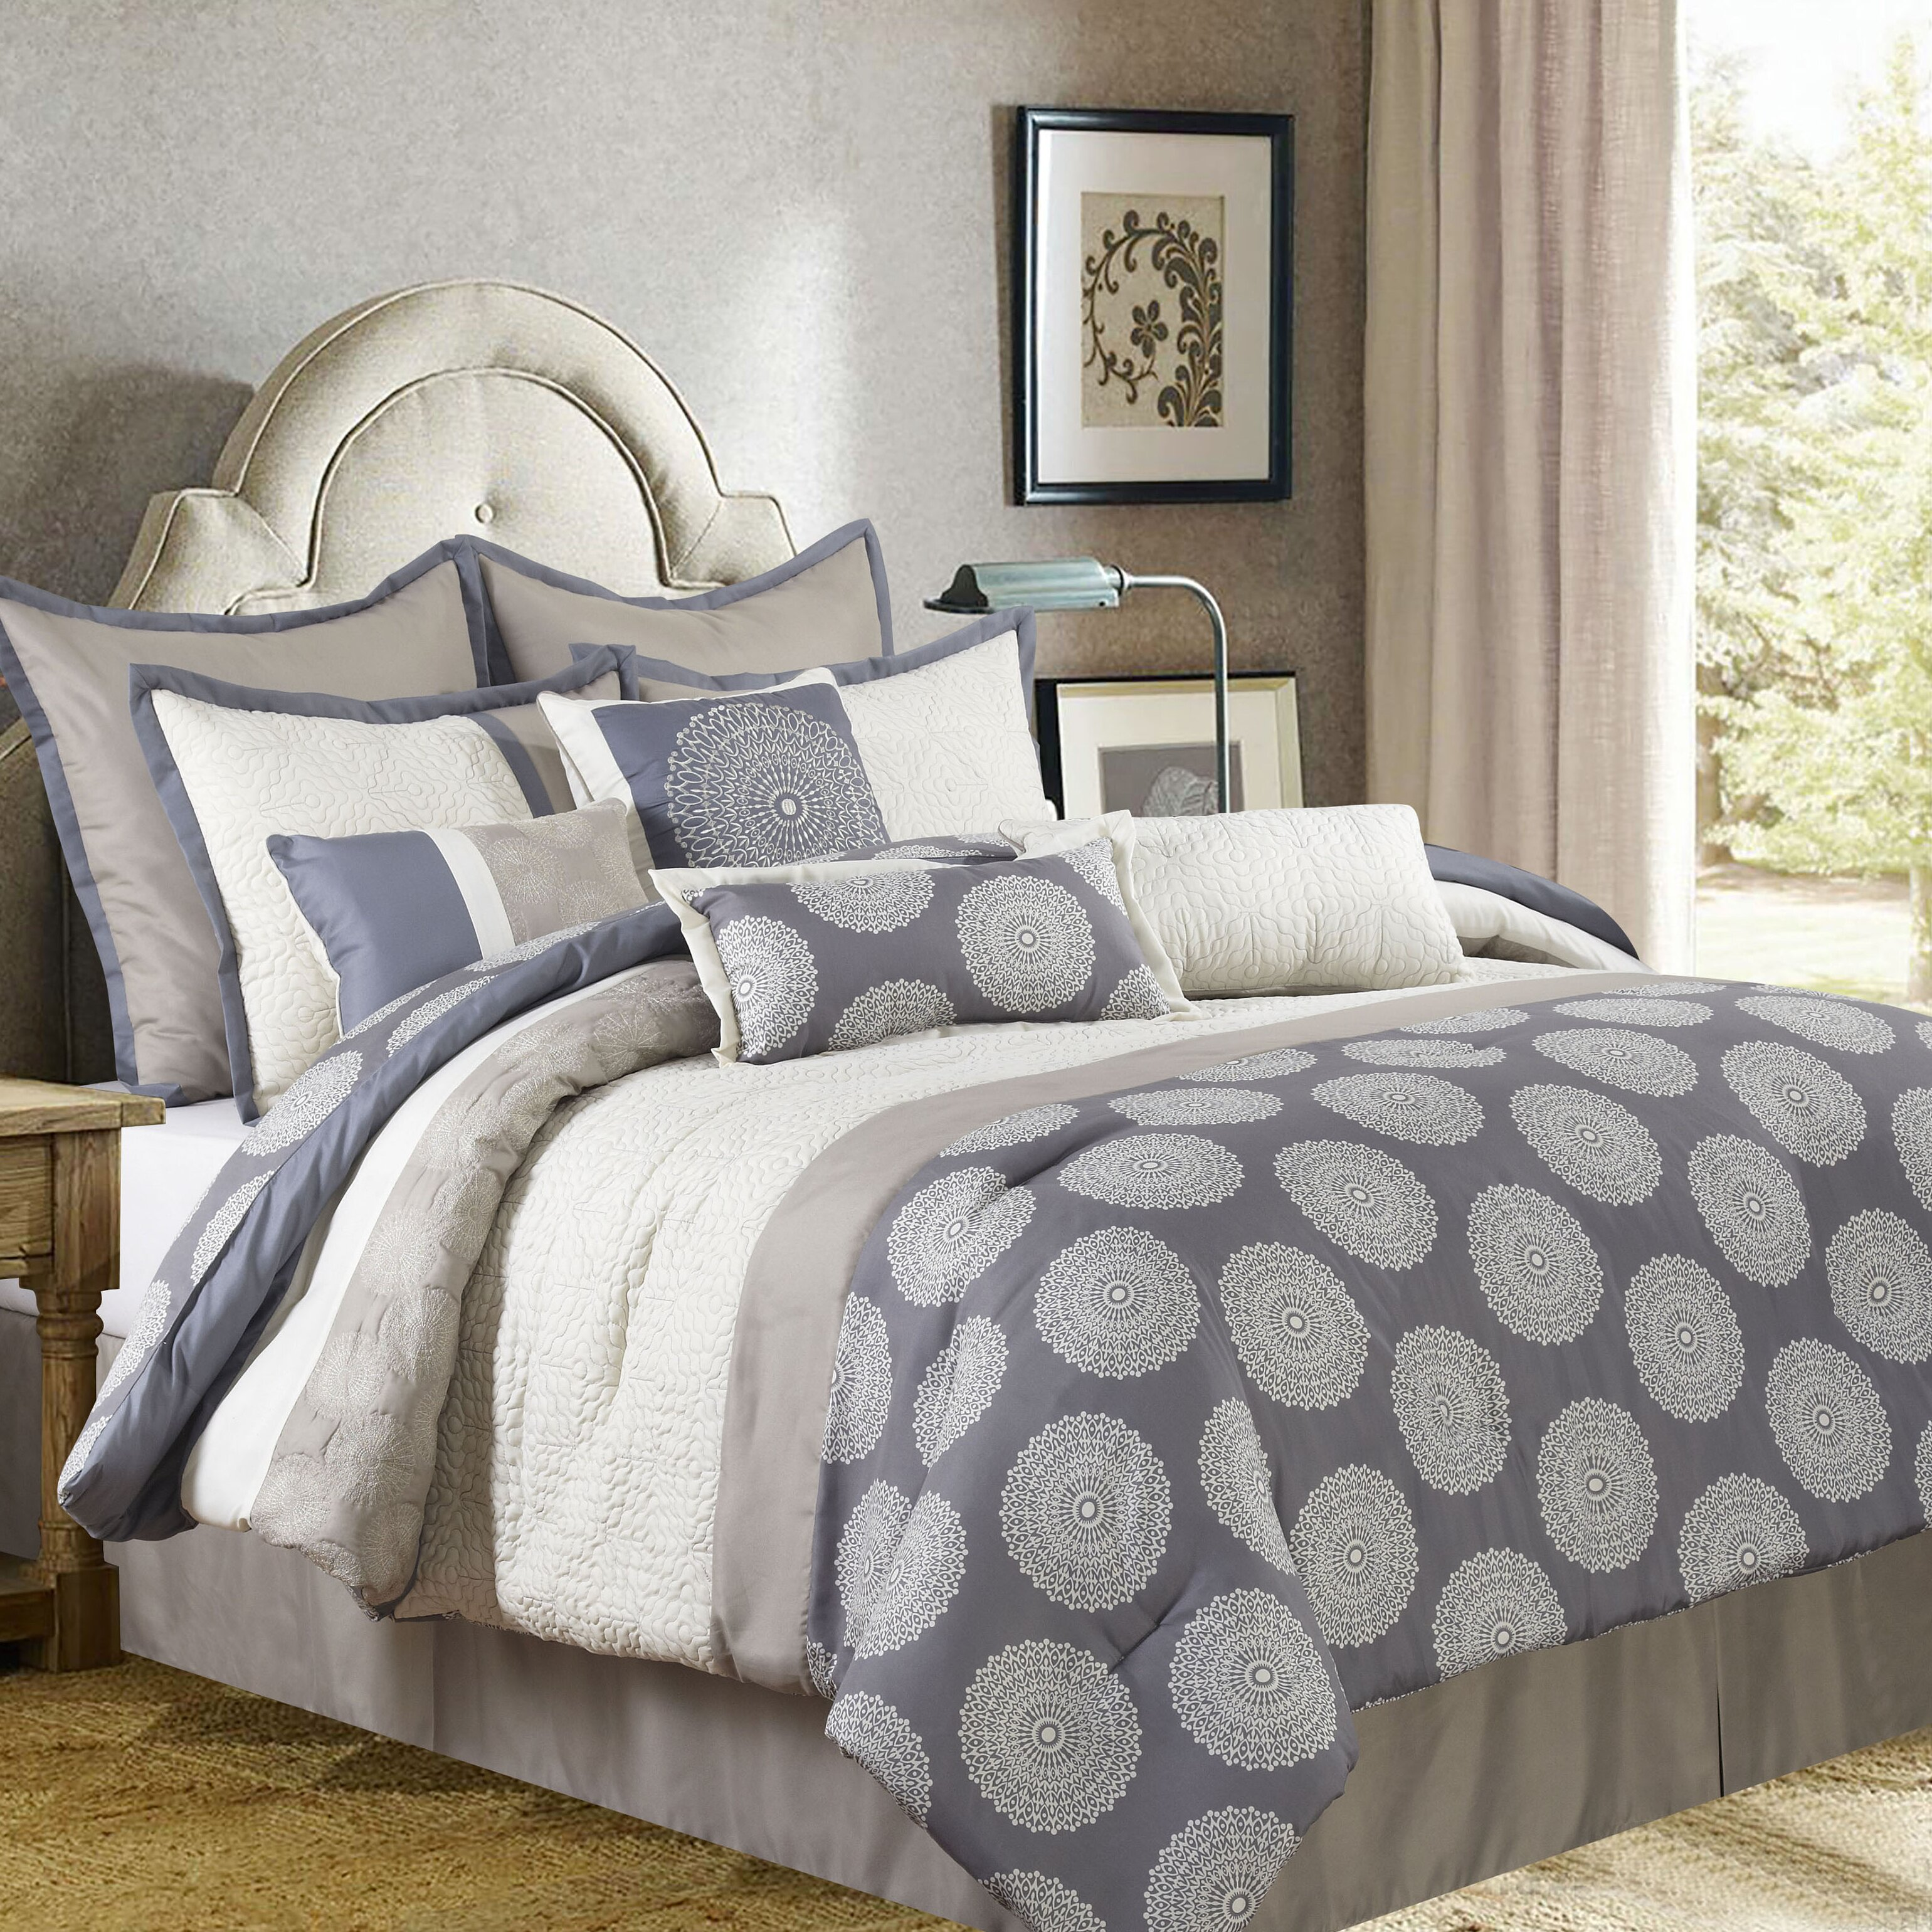 nanshing america, inc dante 10 piece comforter set & reviews | wayfair